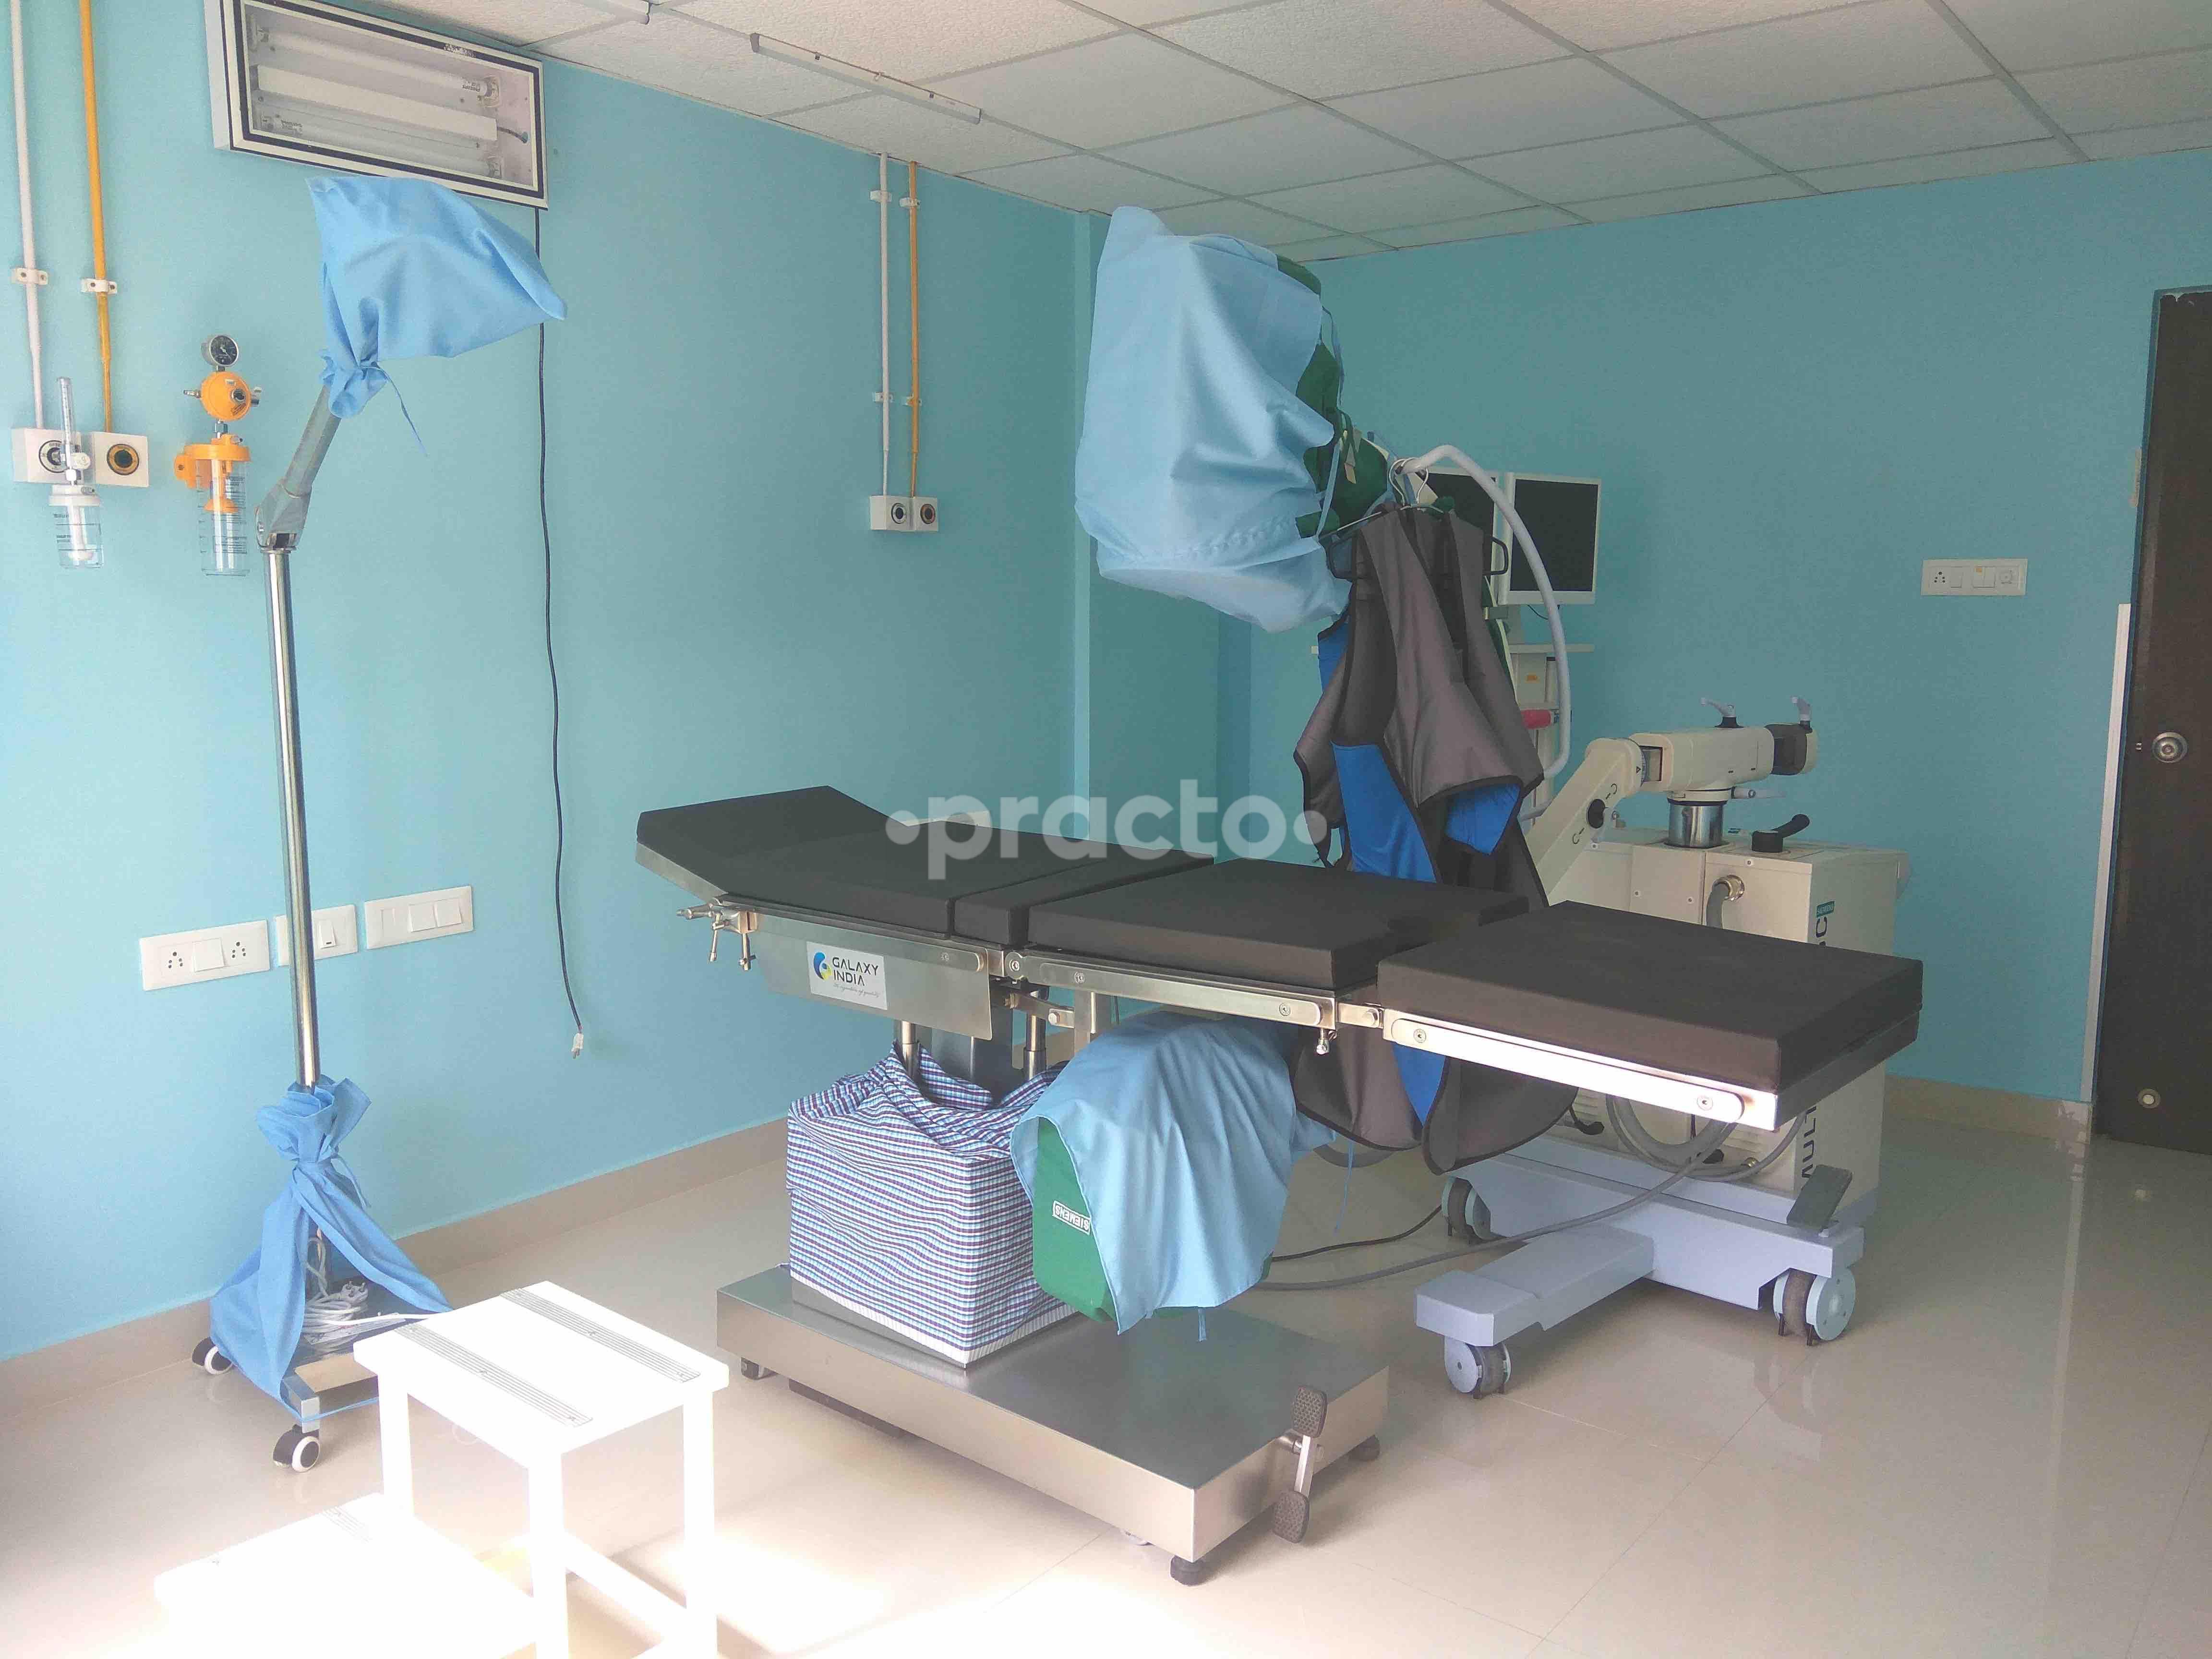 Premature Ejaculation Treatment, Premature Ejaculation Treatment In